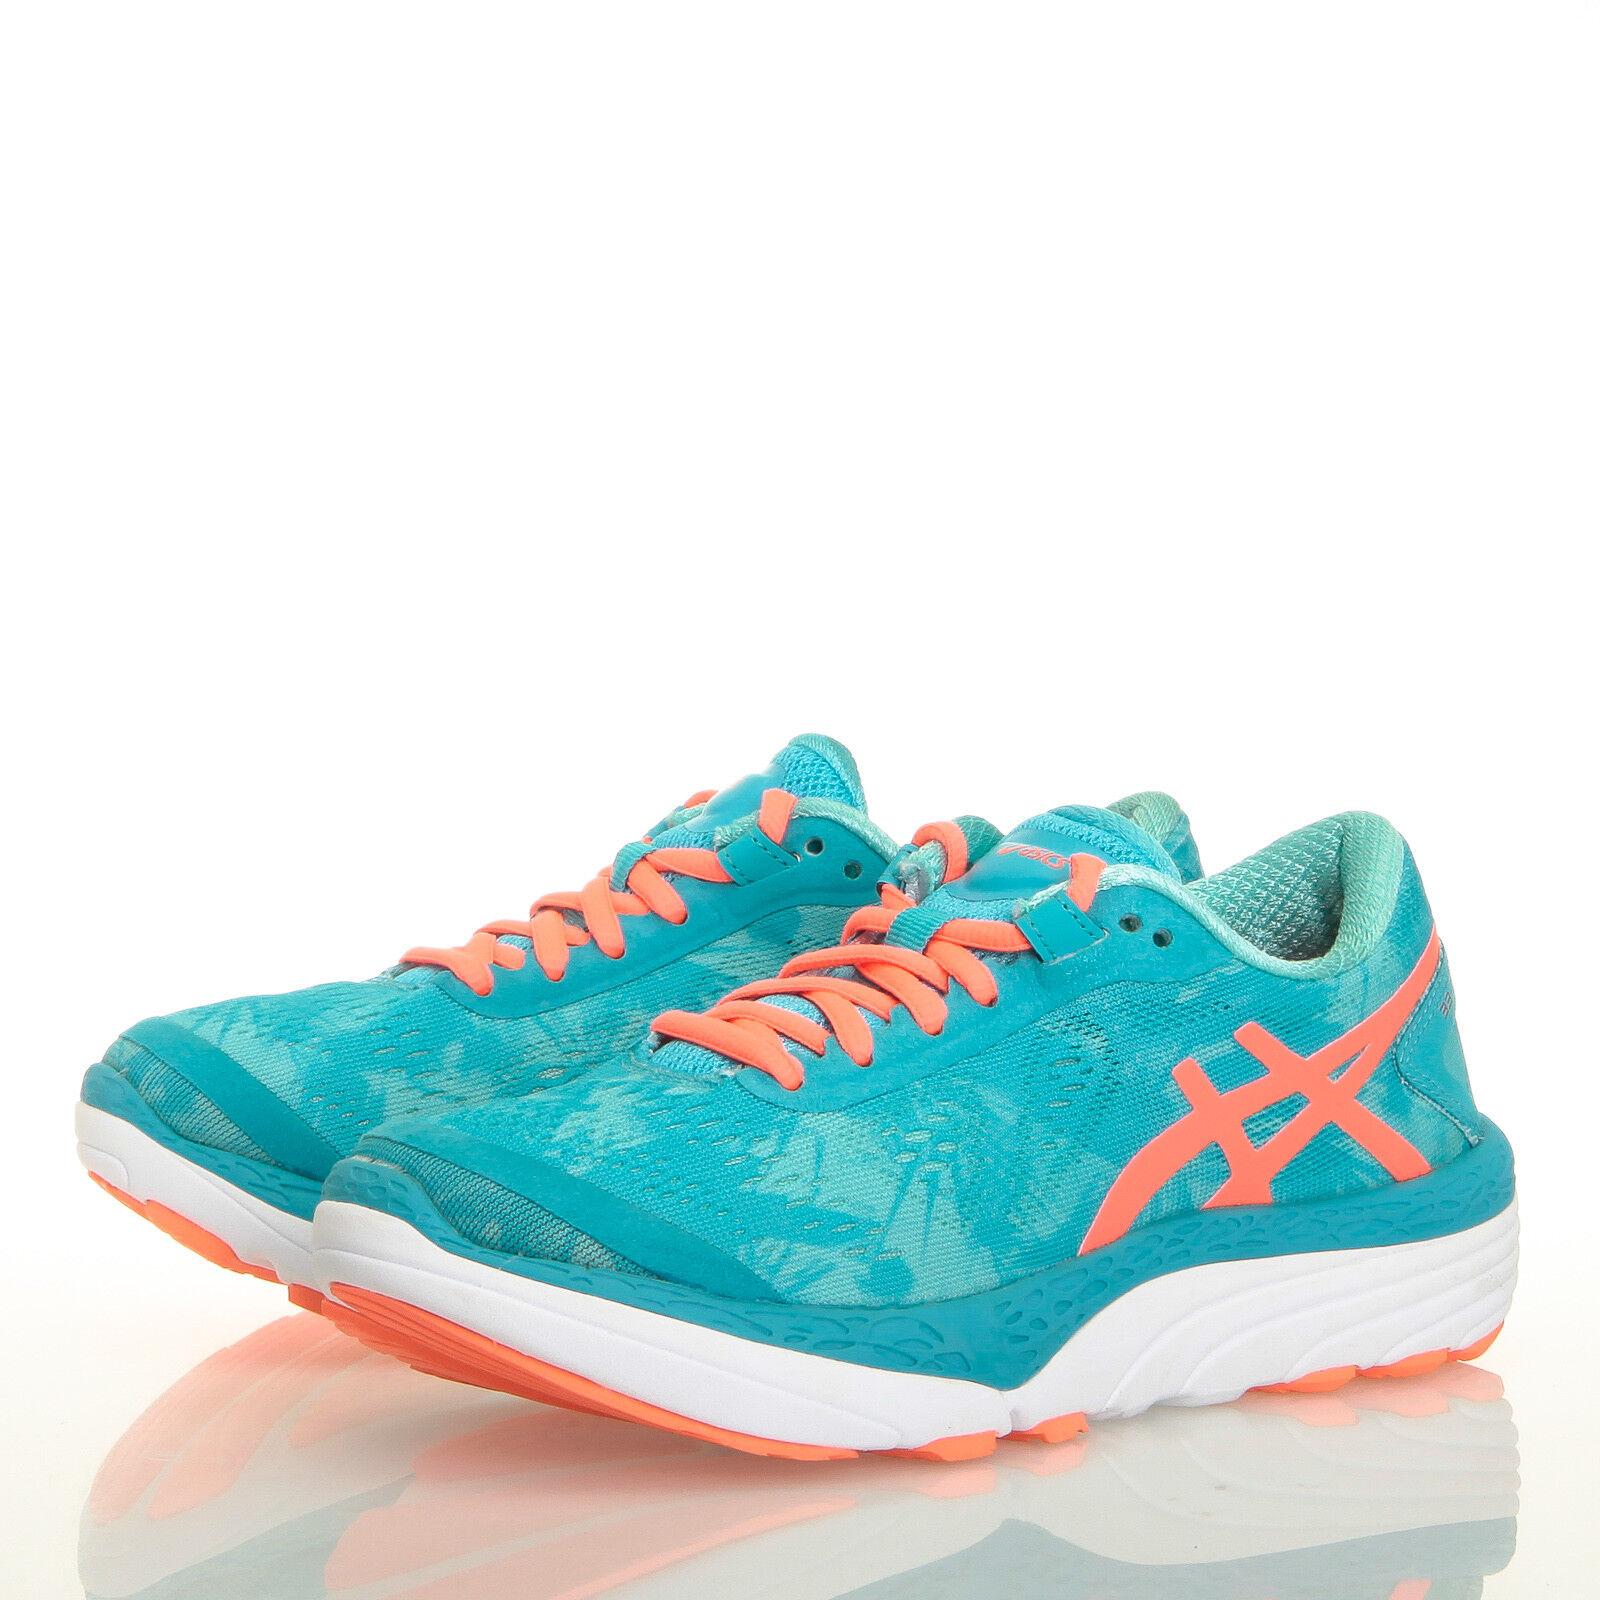 Femme Aquarium Asics M Chaussures Bleu Aruba 33 De Fl3uTKJc15